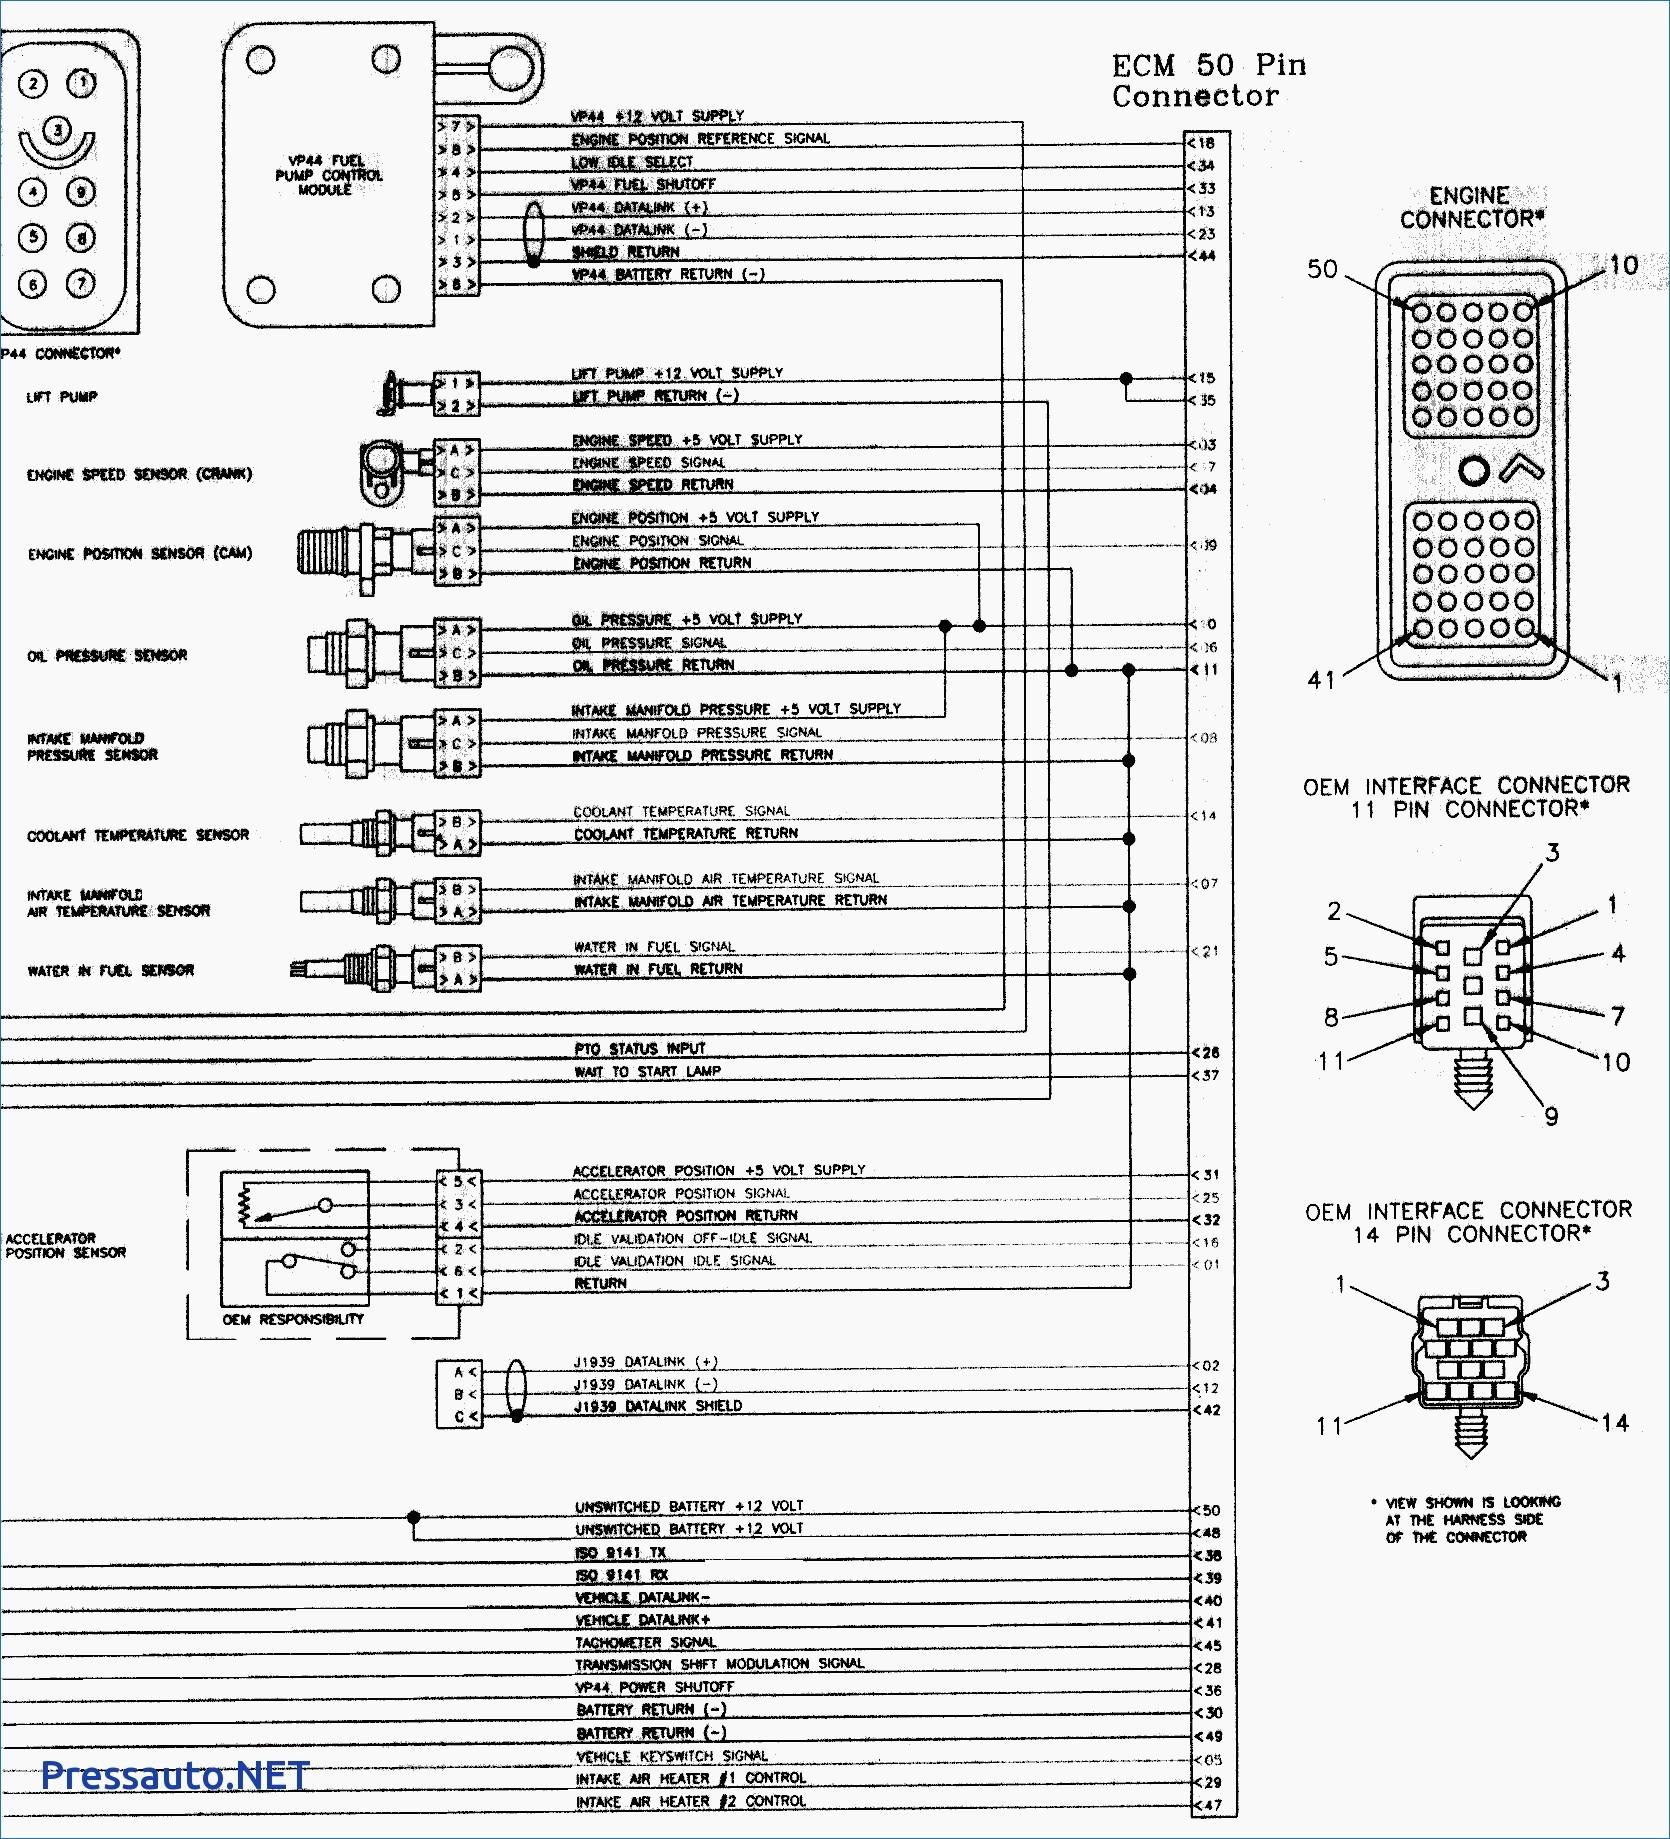 2001 dodge ram wiring diagram wiring diagram 1995 dodge ram trailer wiring diagram 2001 dodge ram